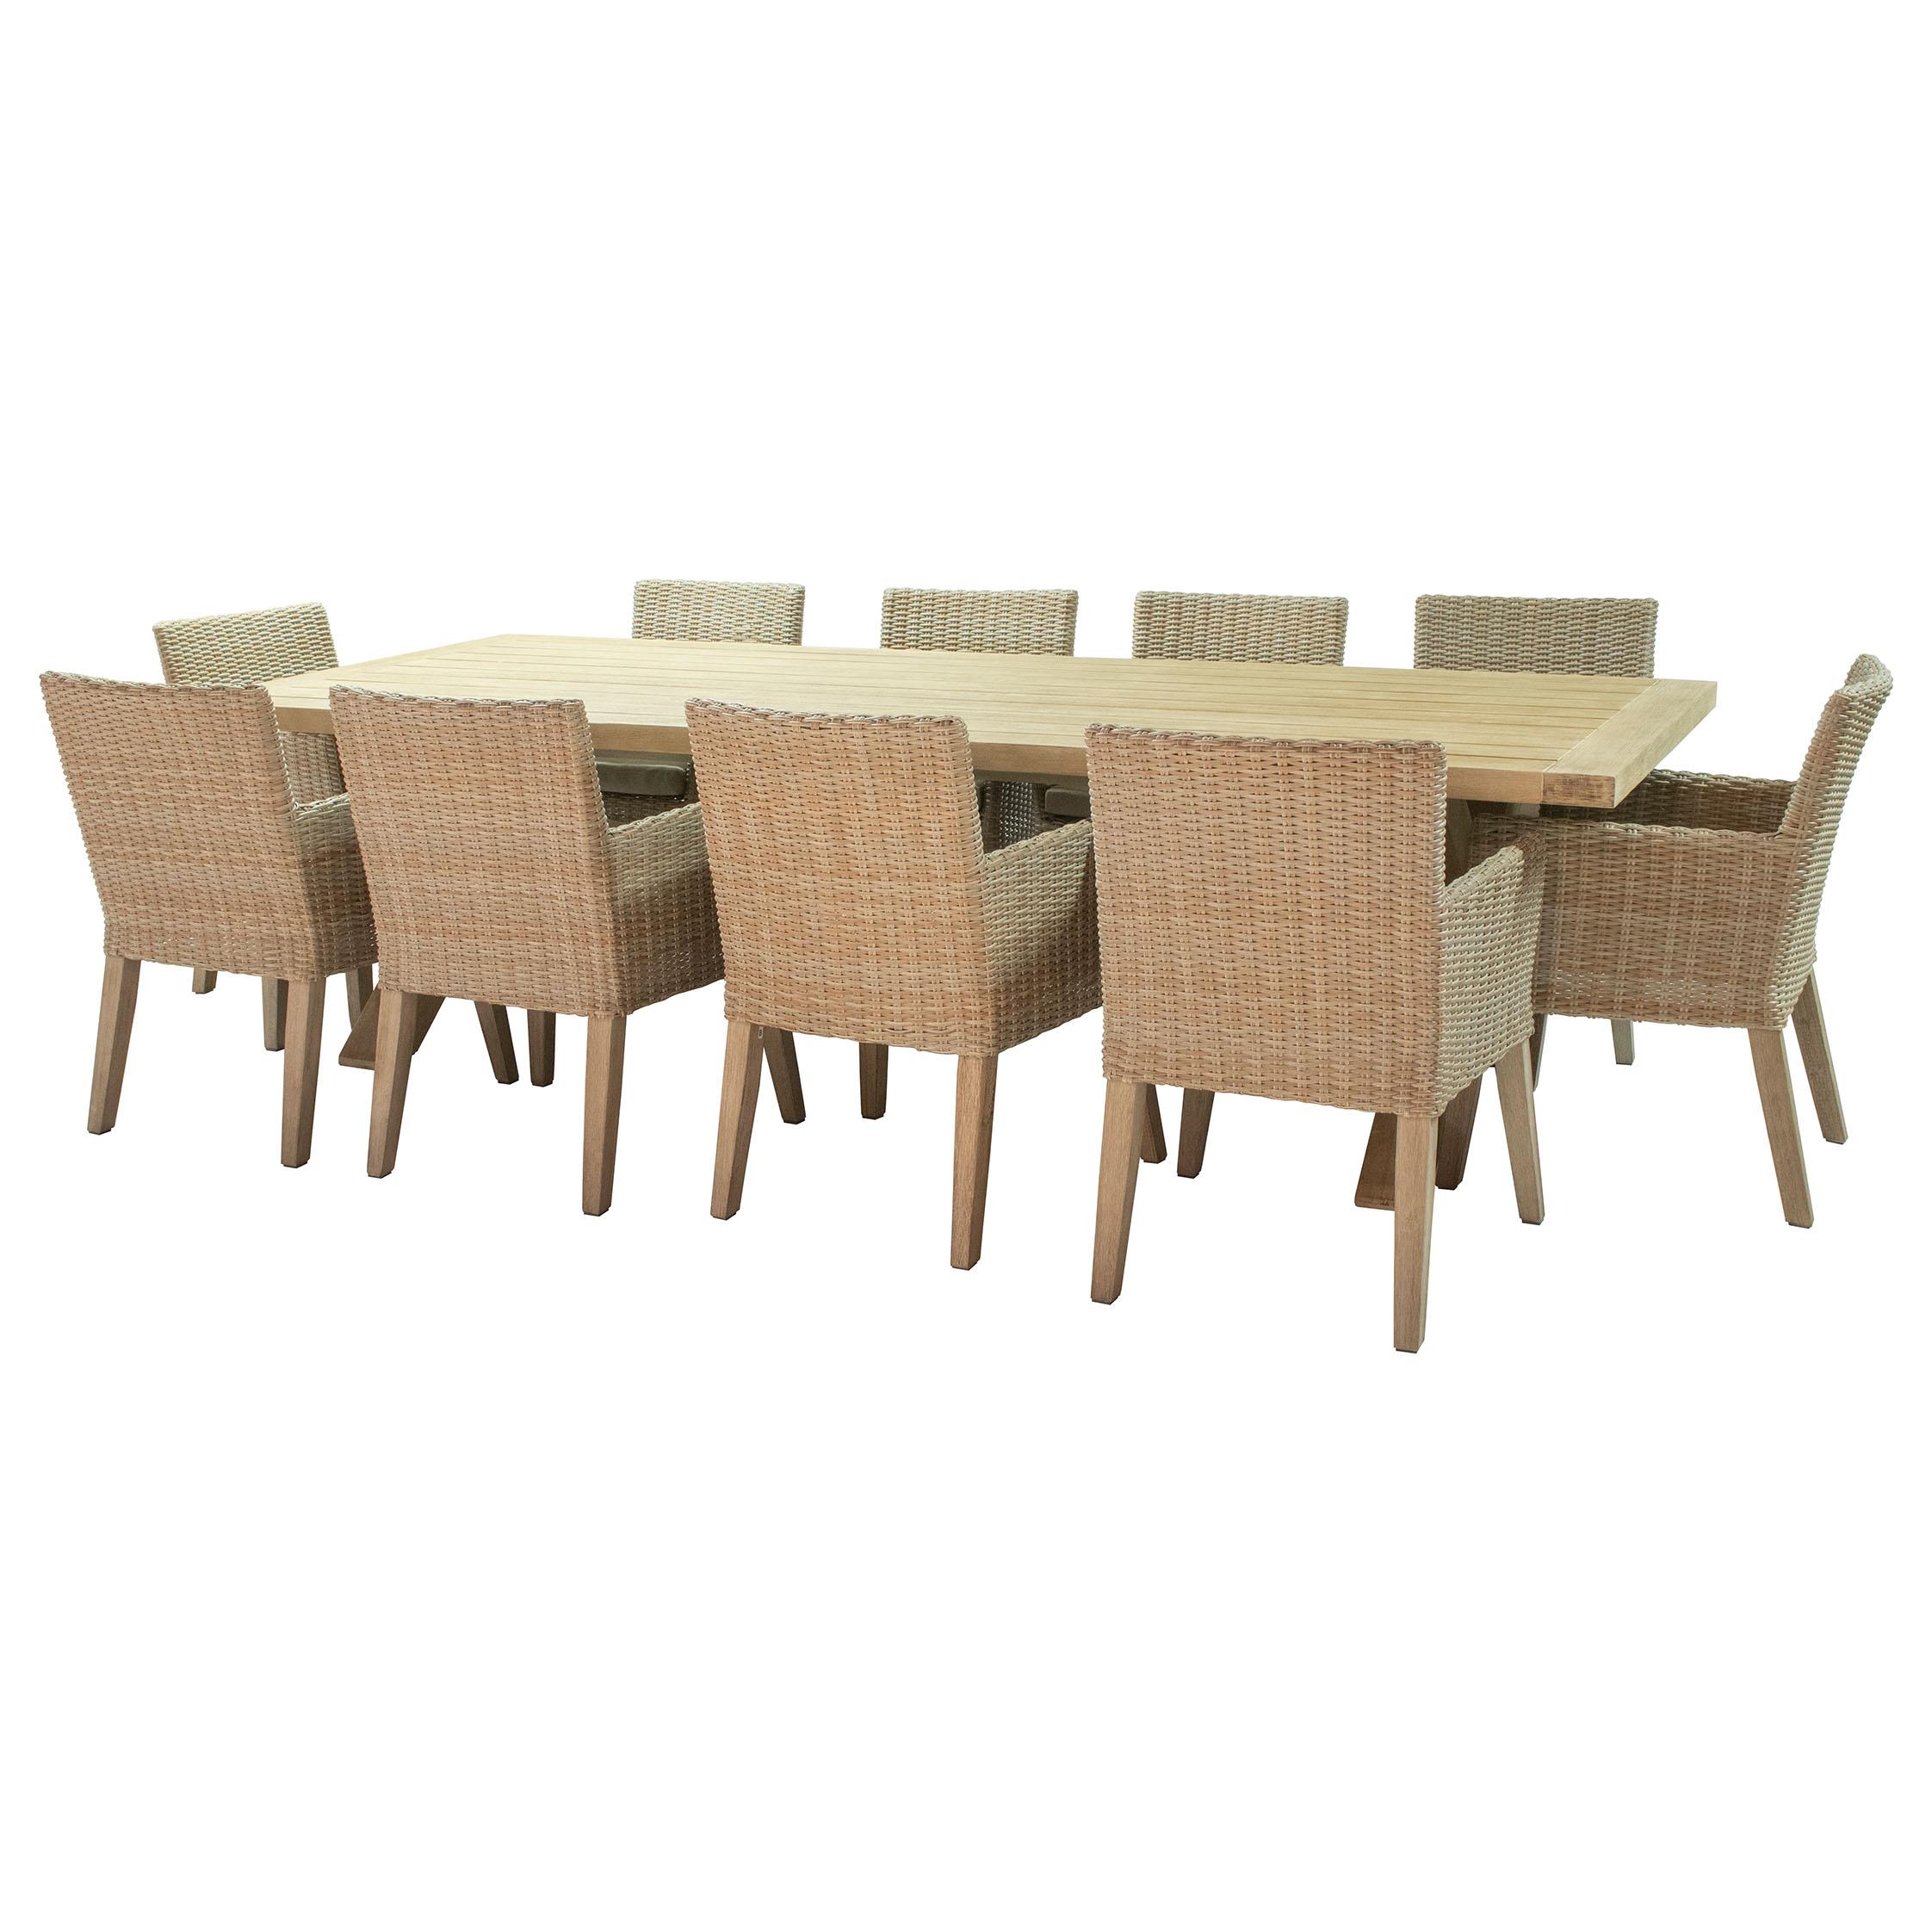 Grip 10 seater Dining set